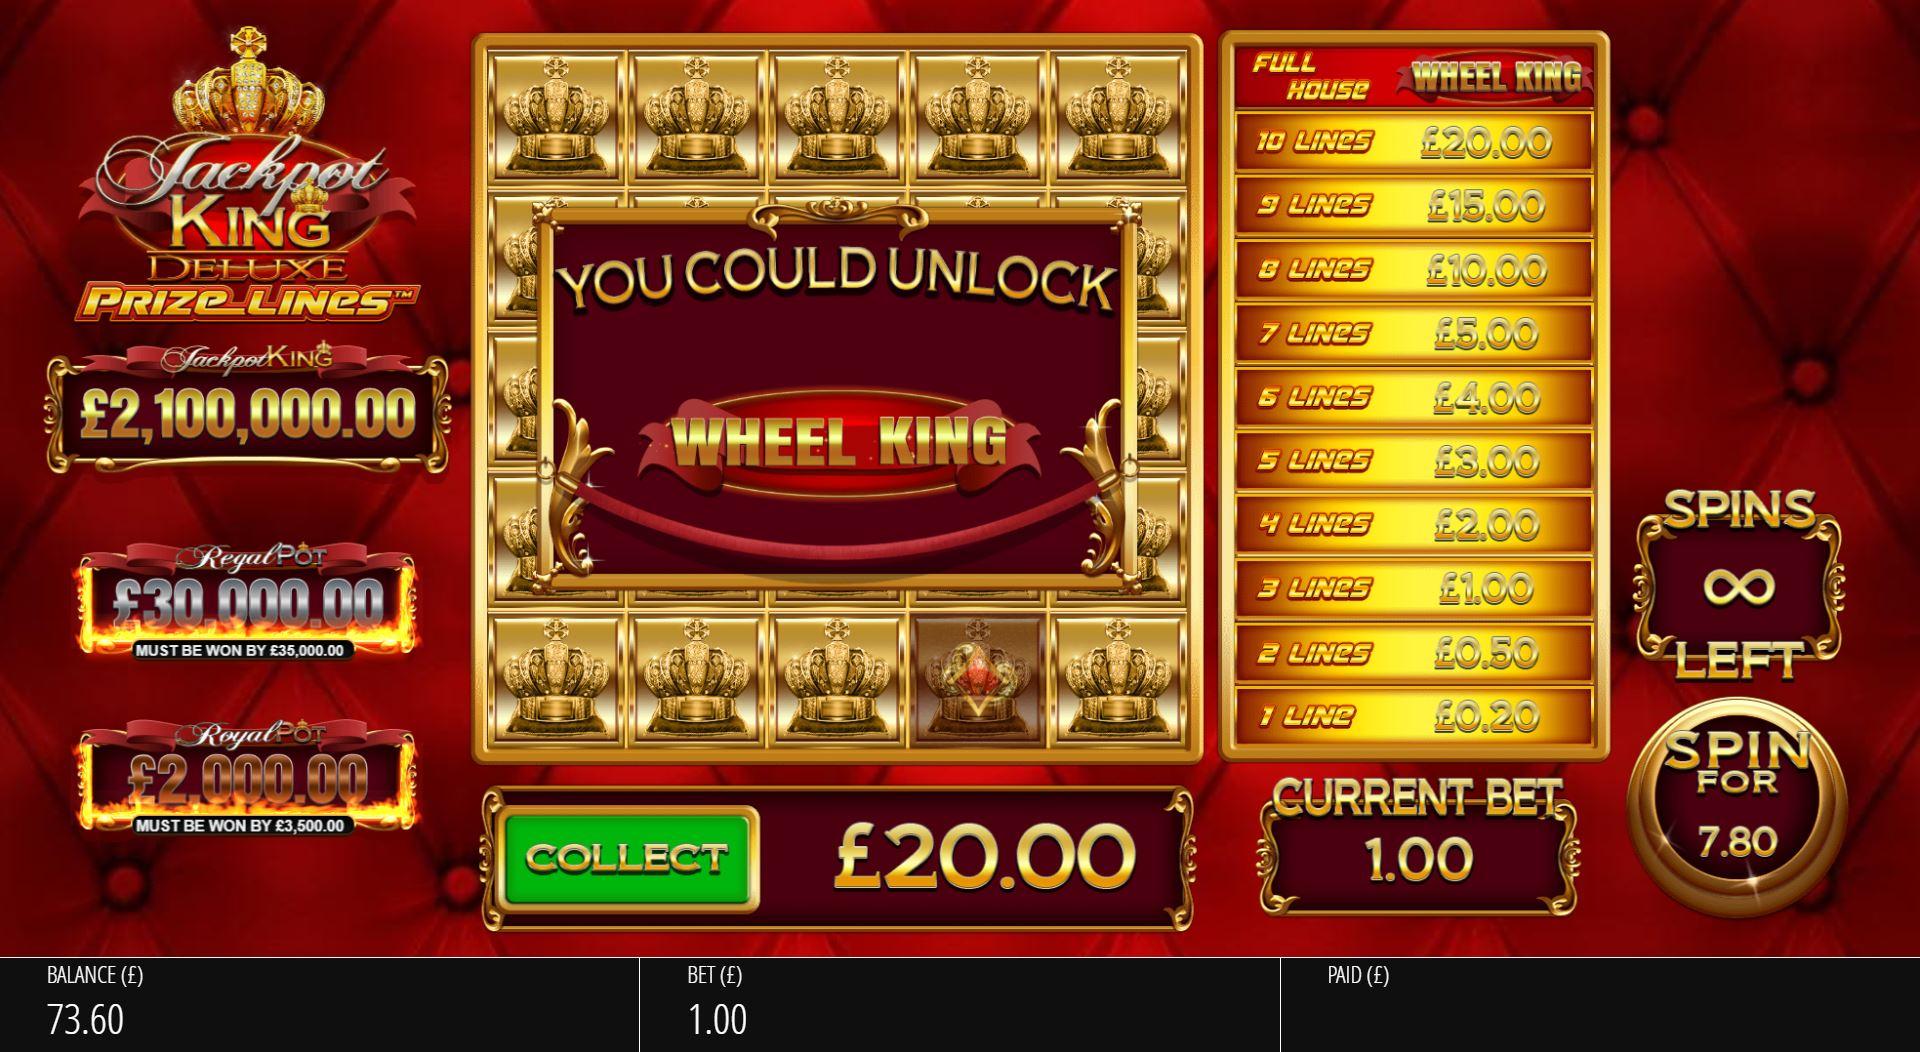 Jackpot King Prize Lines - Base04